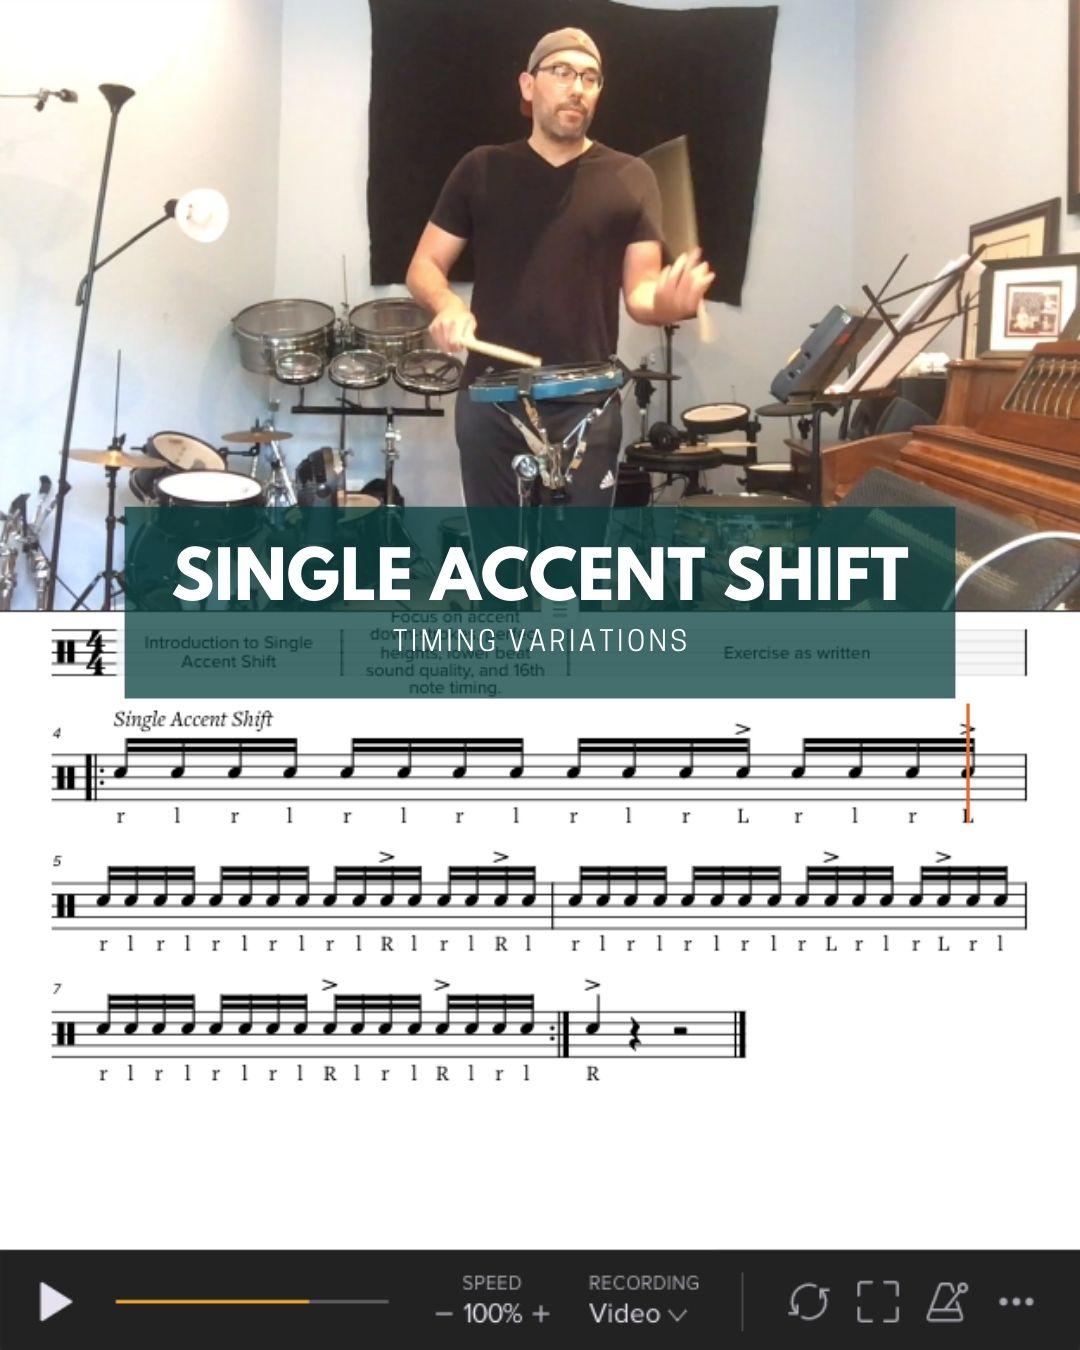 Single Accent Shift